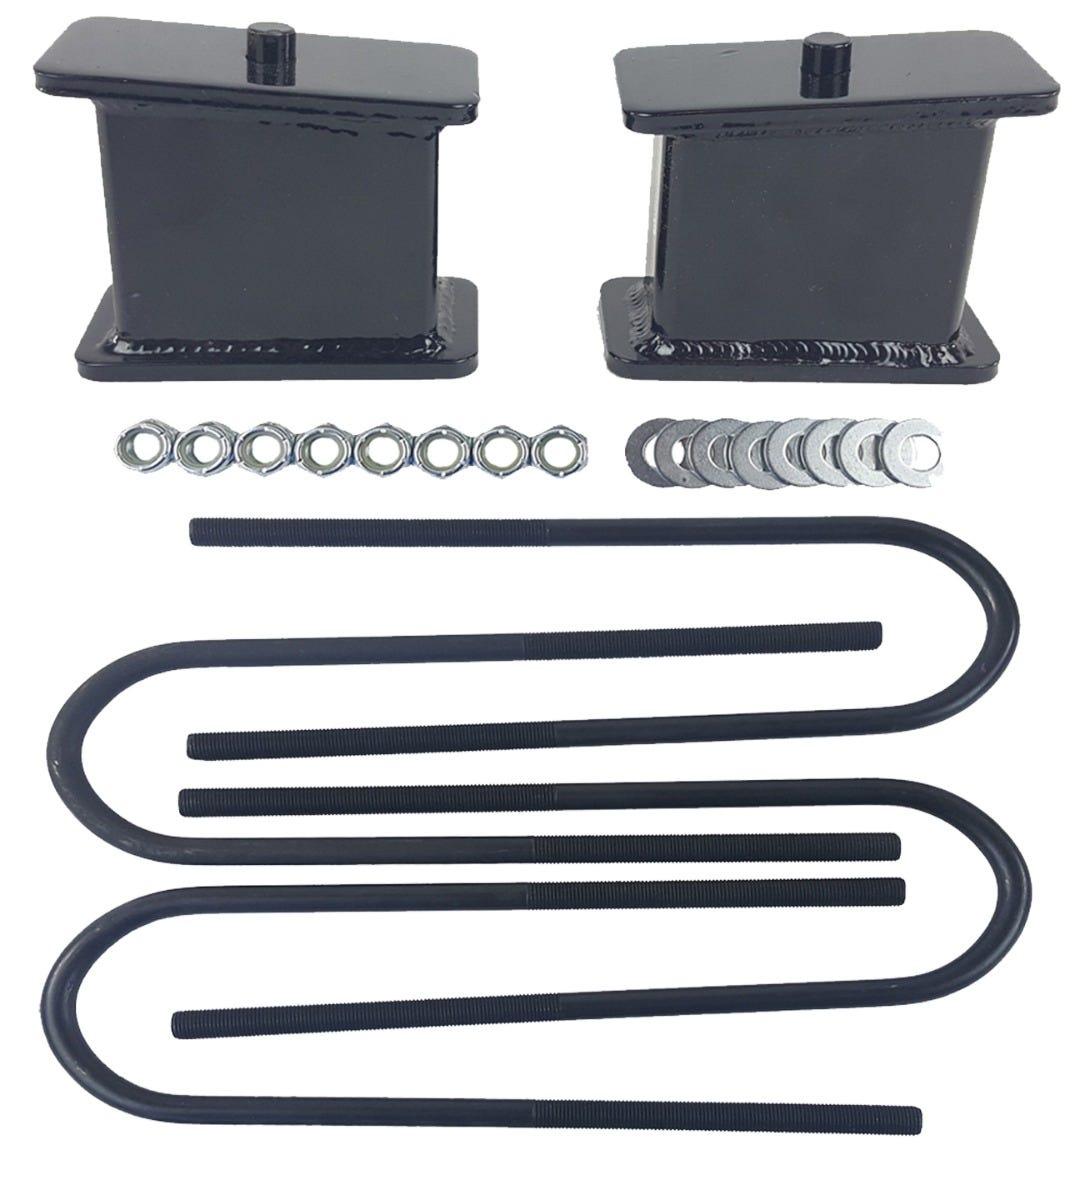 "3//4 Drop Kit Fits S10 2wd 4 Cyl 3/"" Front Springs 4/"" Rear Fab Steel Blocks Ubolts"